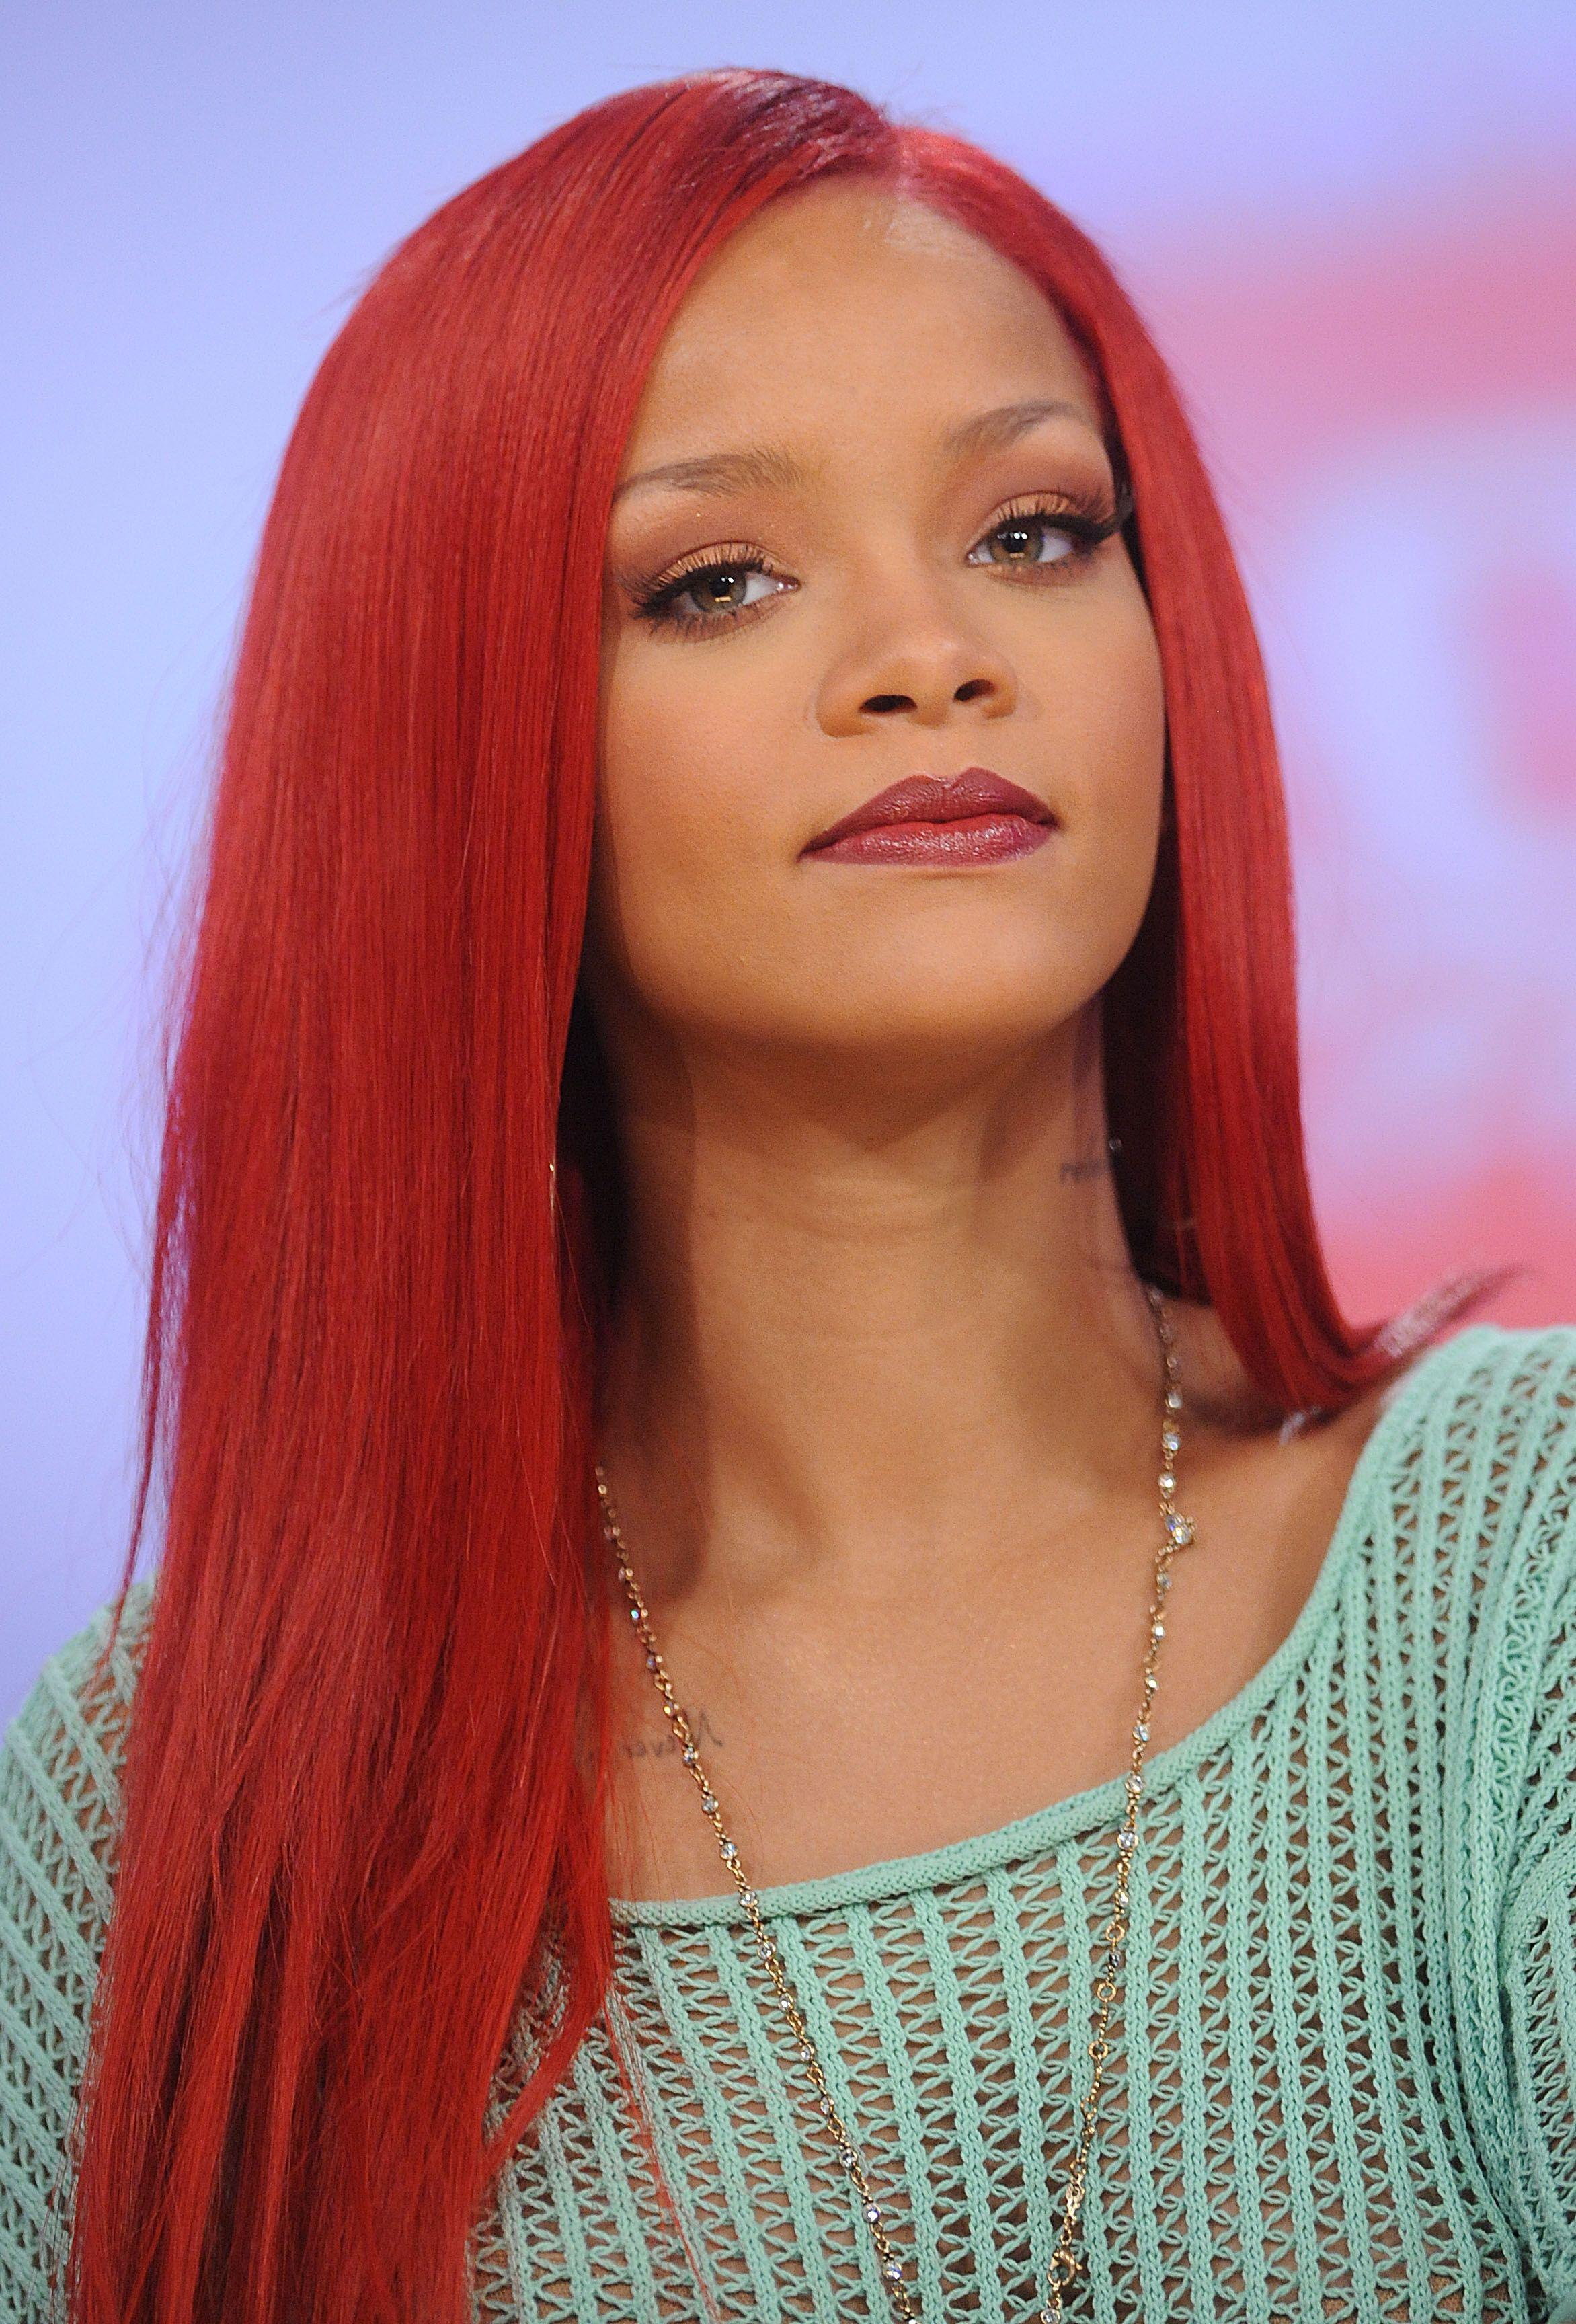 Rihanna | Rihanna red hair, Red hair color shades, Rihanna